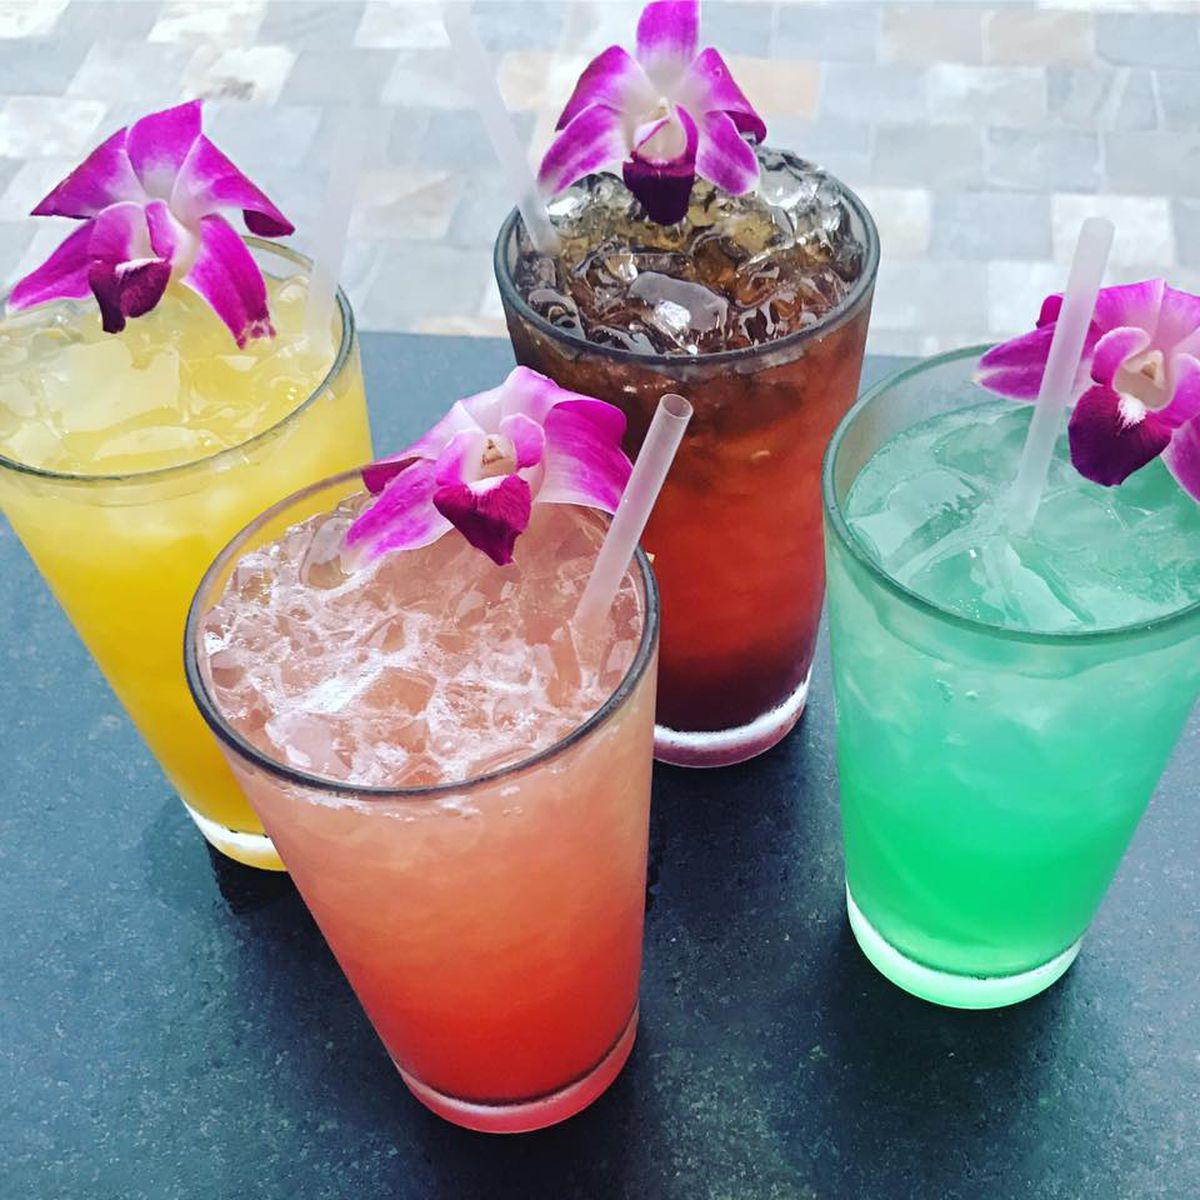 Bubba Gump S Mai Tai Bar To Close At Ala Moana Ahead Of Olive Garden S Arrival